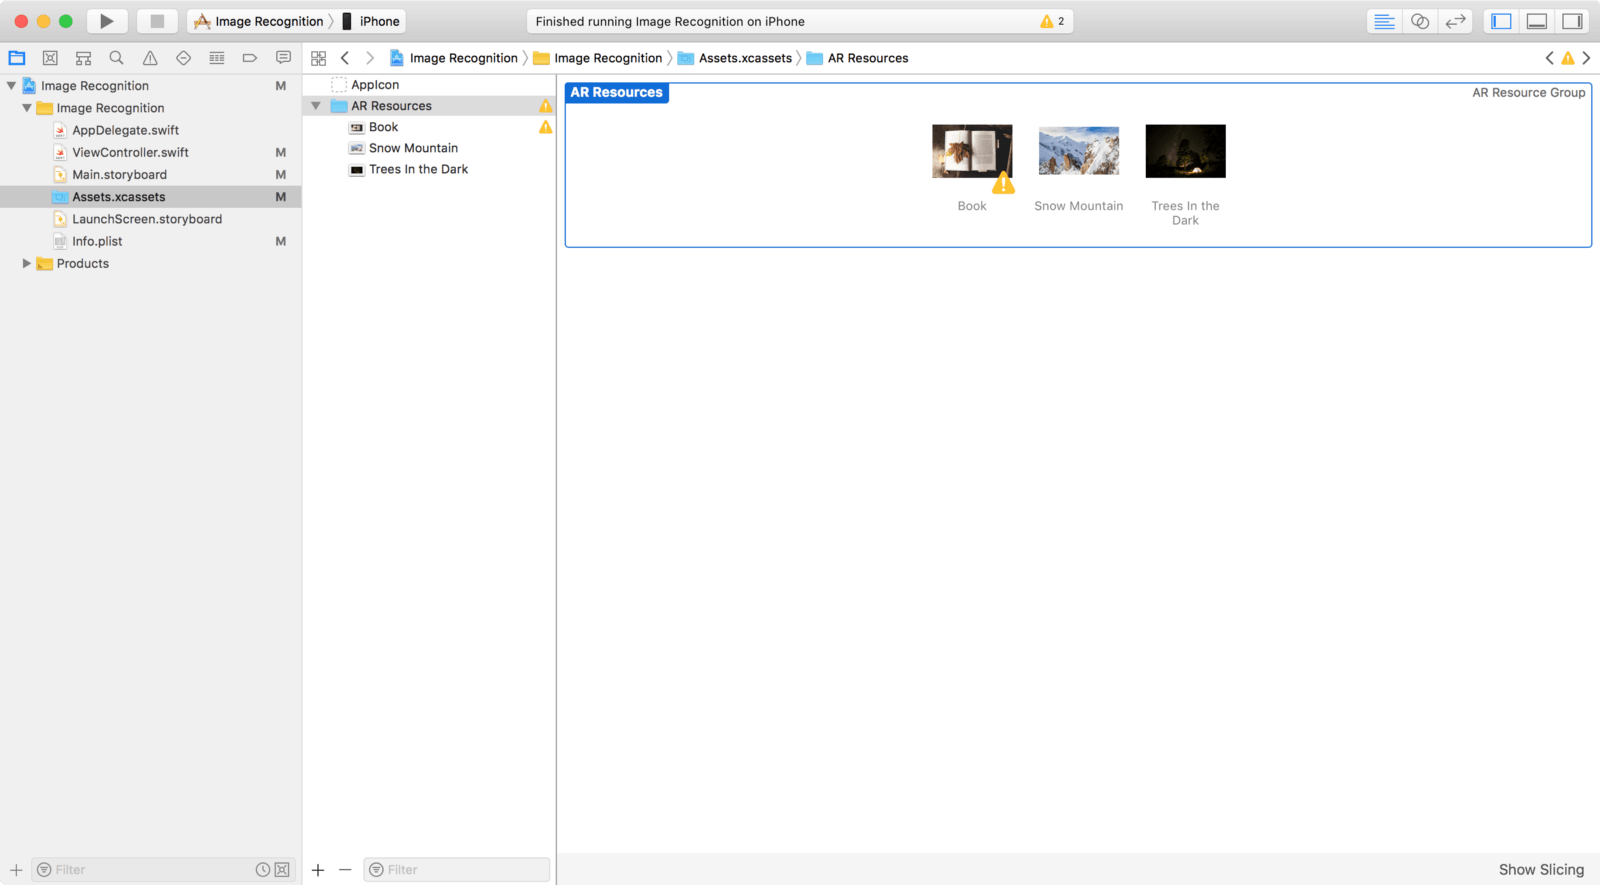 Xcode image asset